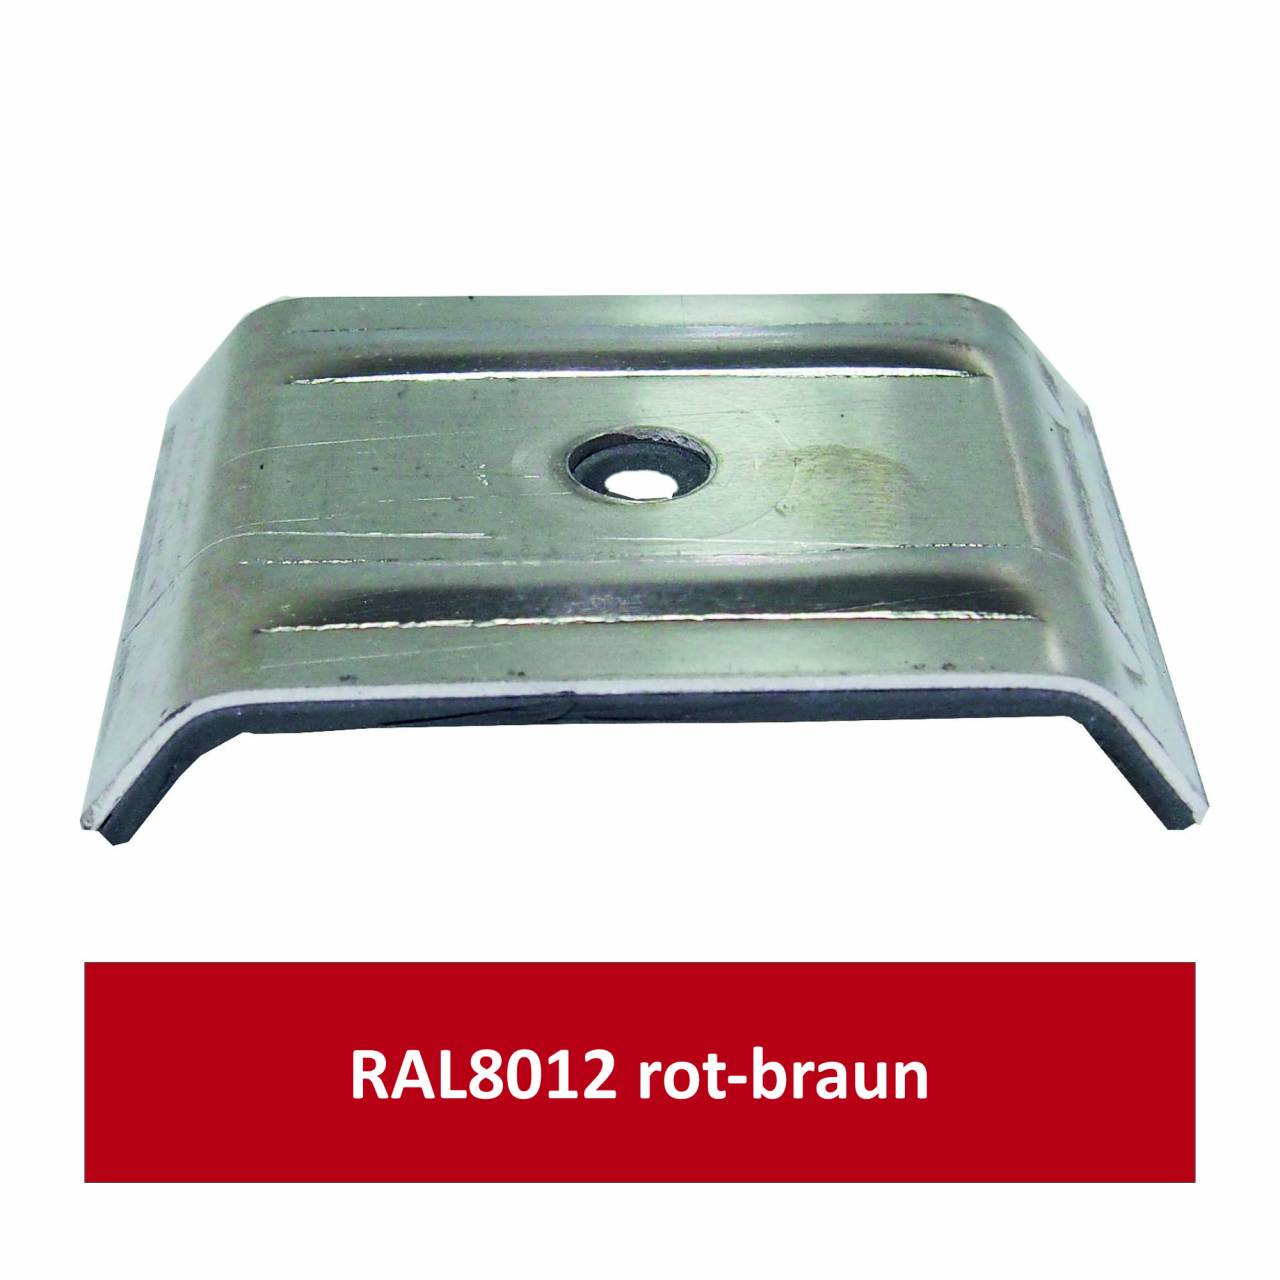 Kalotten für 35/207, Alu RAL8012 rotbraun/ Pck a 100 Stück